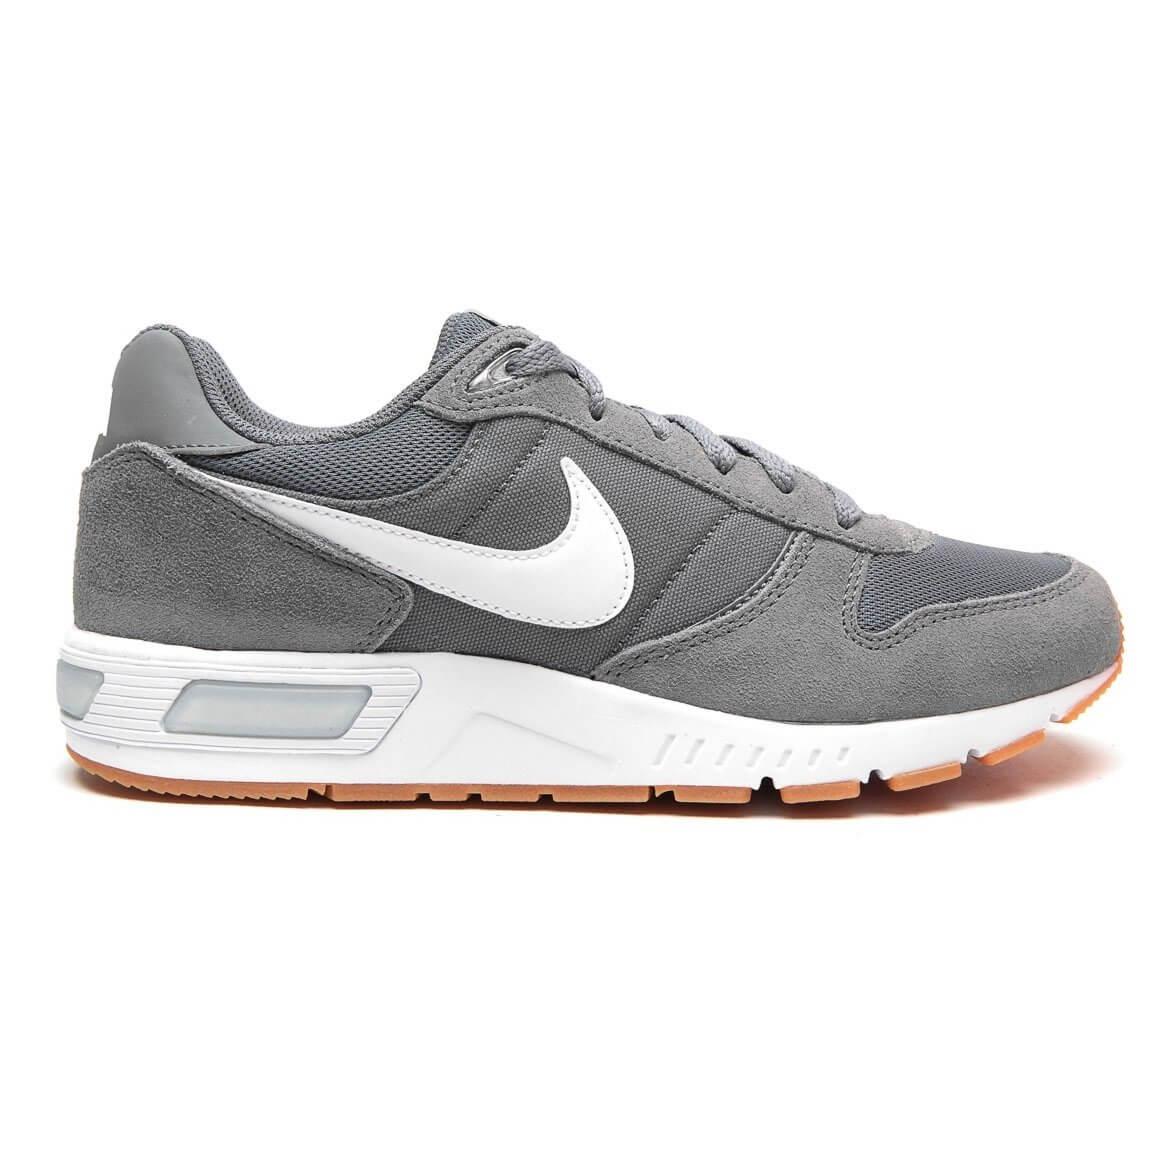 f15a6ce00a8 Tênis Masculino Nike Nightgazer 644402-007 - Cinza - Calçados Online ...